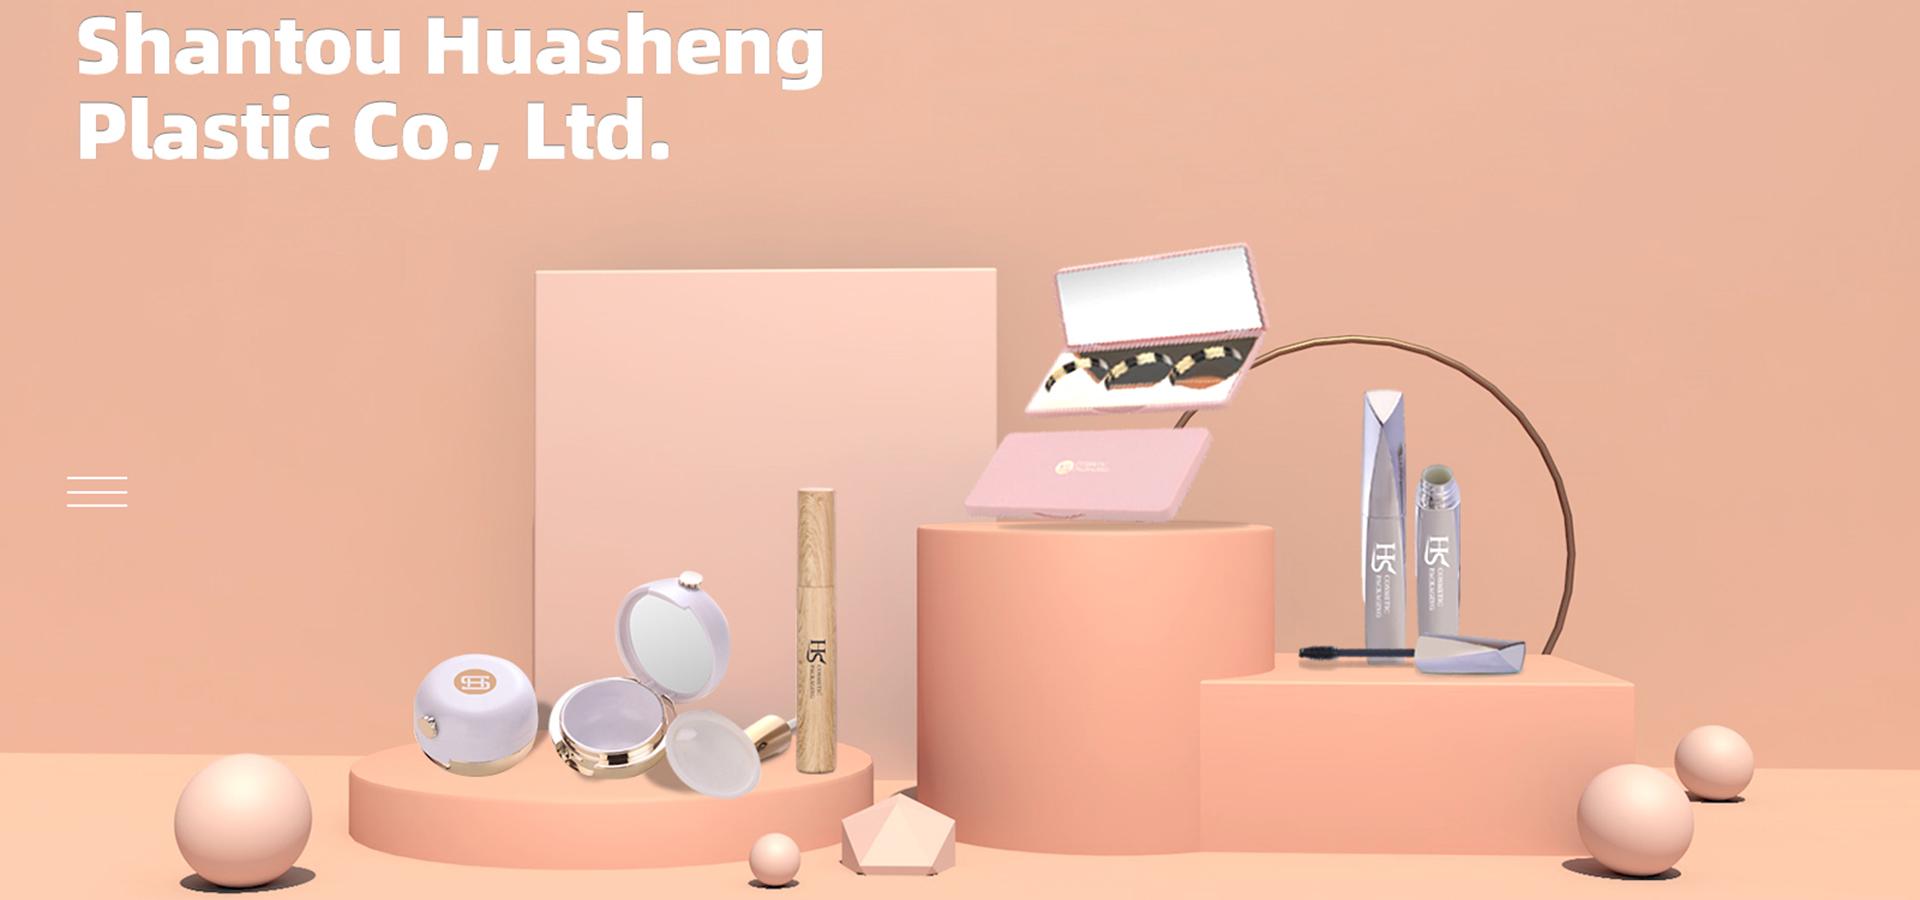 huasheng101